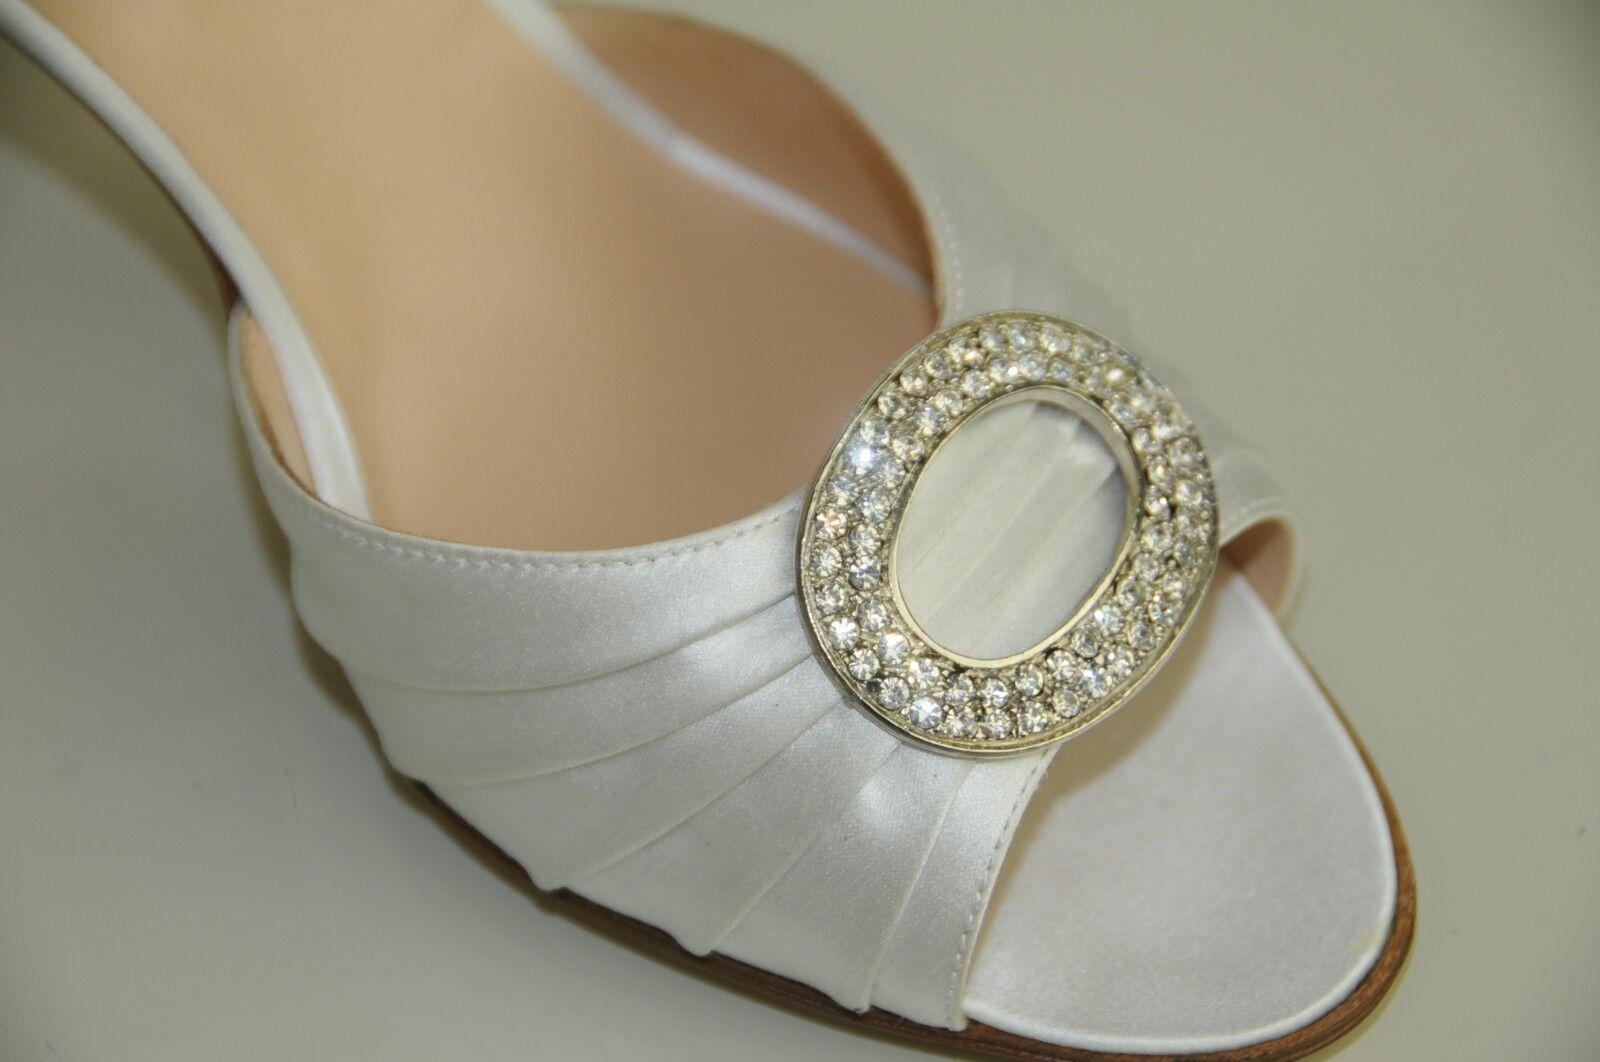 $785 NEW SHOES MANOLO BLAHNIK SEDARABY 90 Weiß Satin JEWELED SHOES NEW 41 Wedding Bridal 9401be